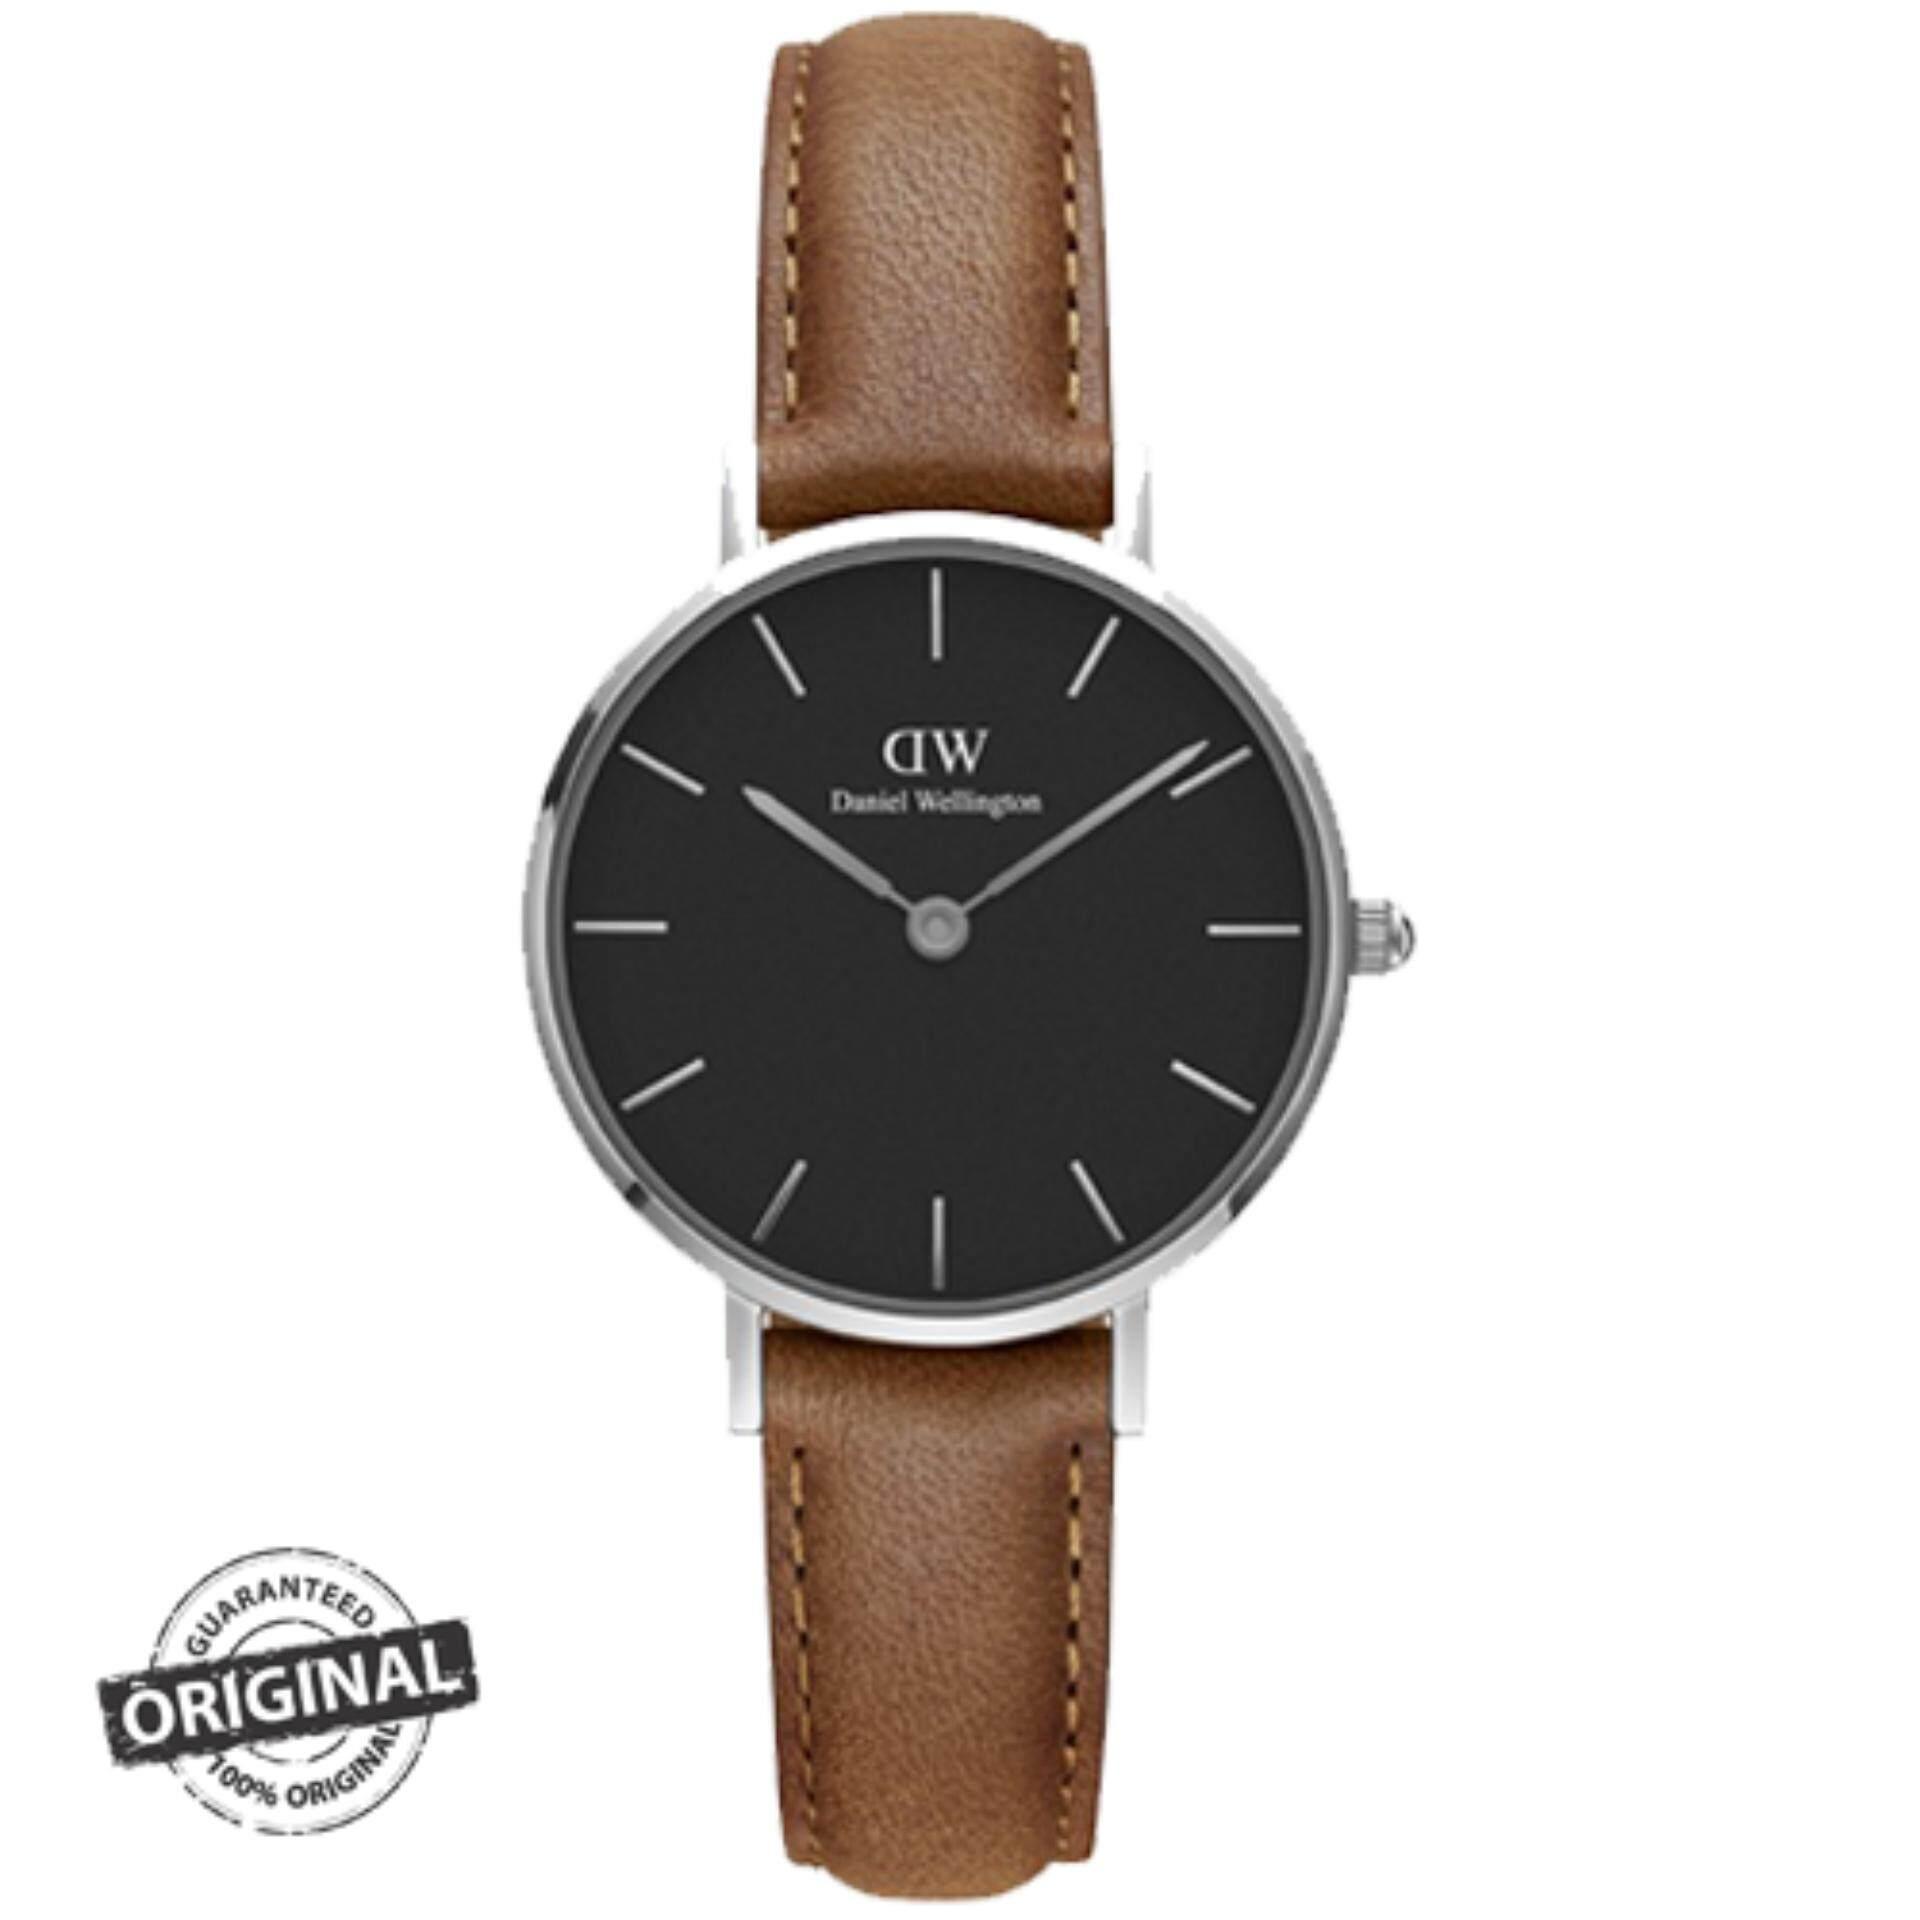 (Original) Daniel Wellington Silver DW00100234 Classic Petite Quartz Watch